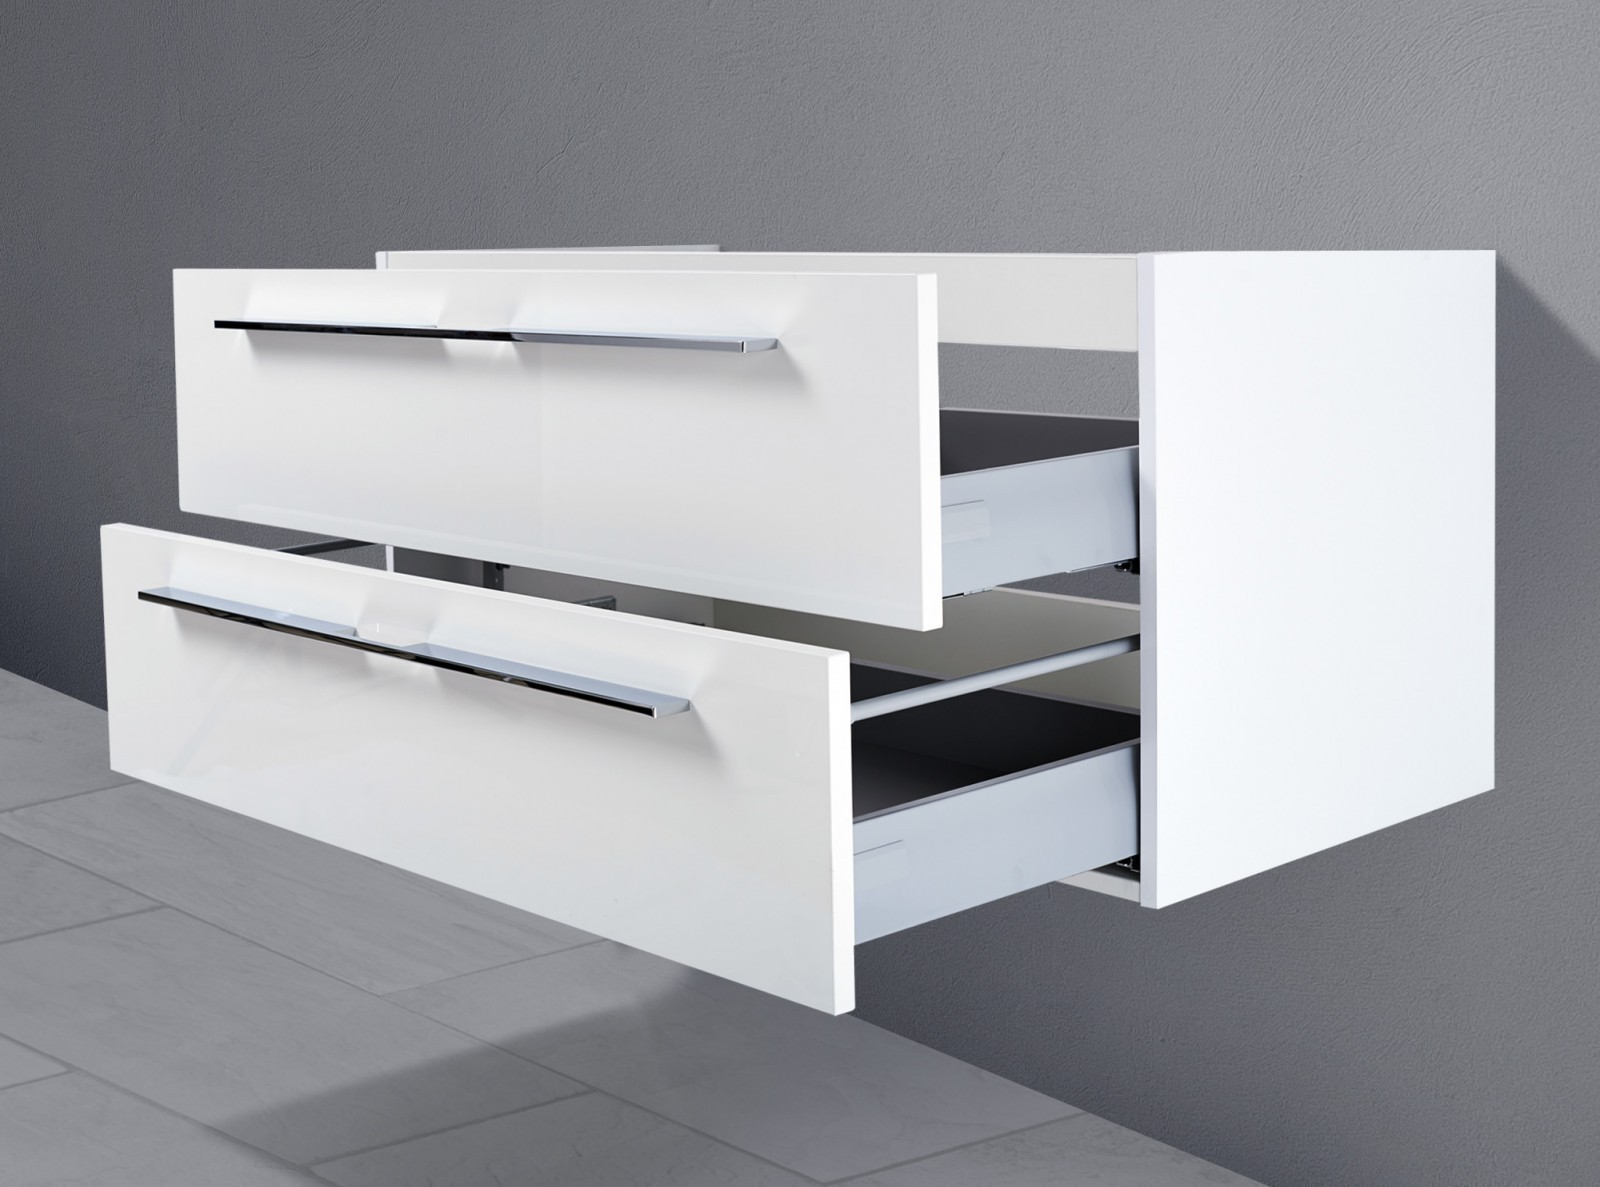 Badezimmer Unterschrank 80 Cm Breit U2013 Goldchunks, Badezimmer Ideen